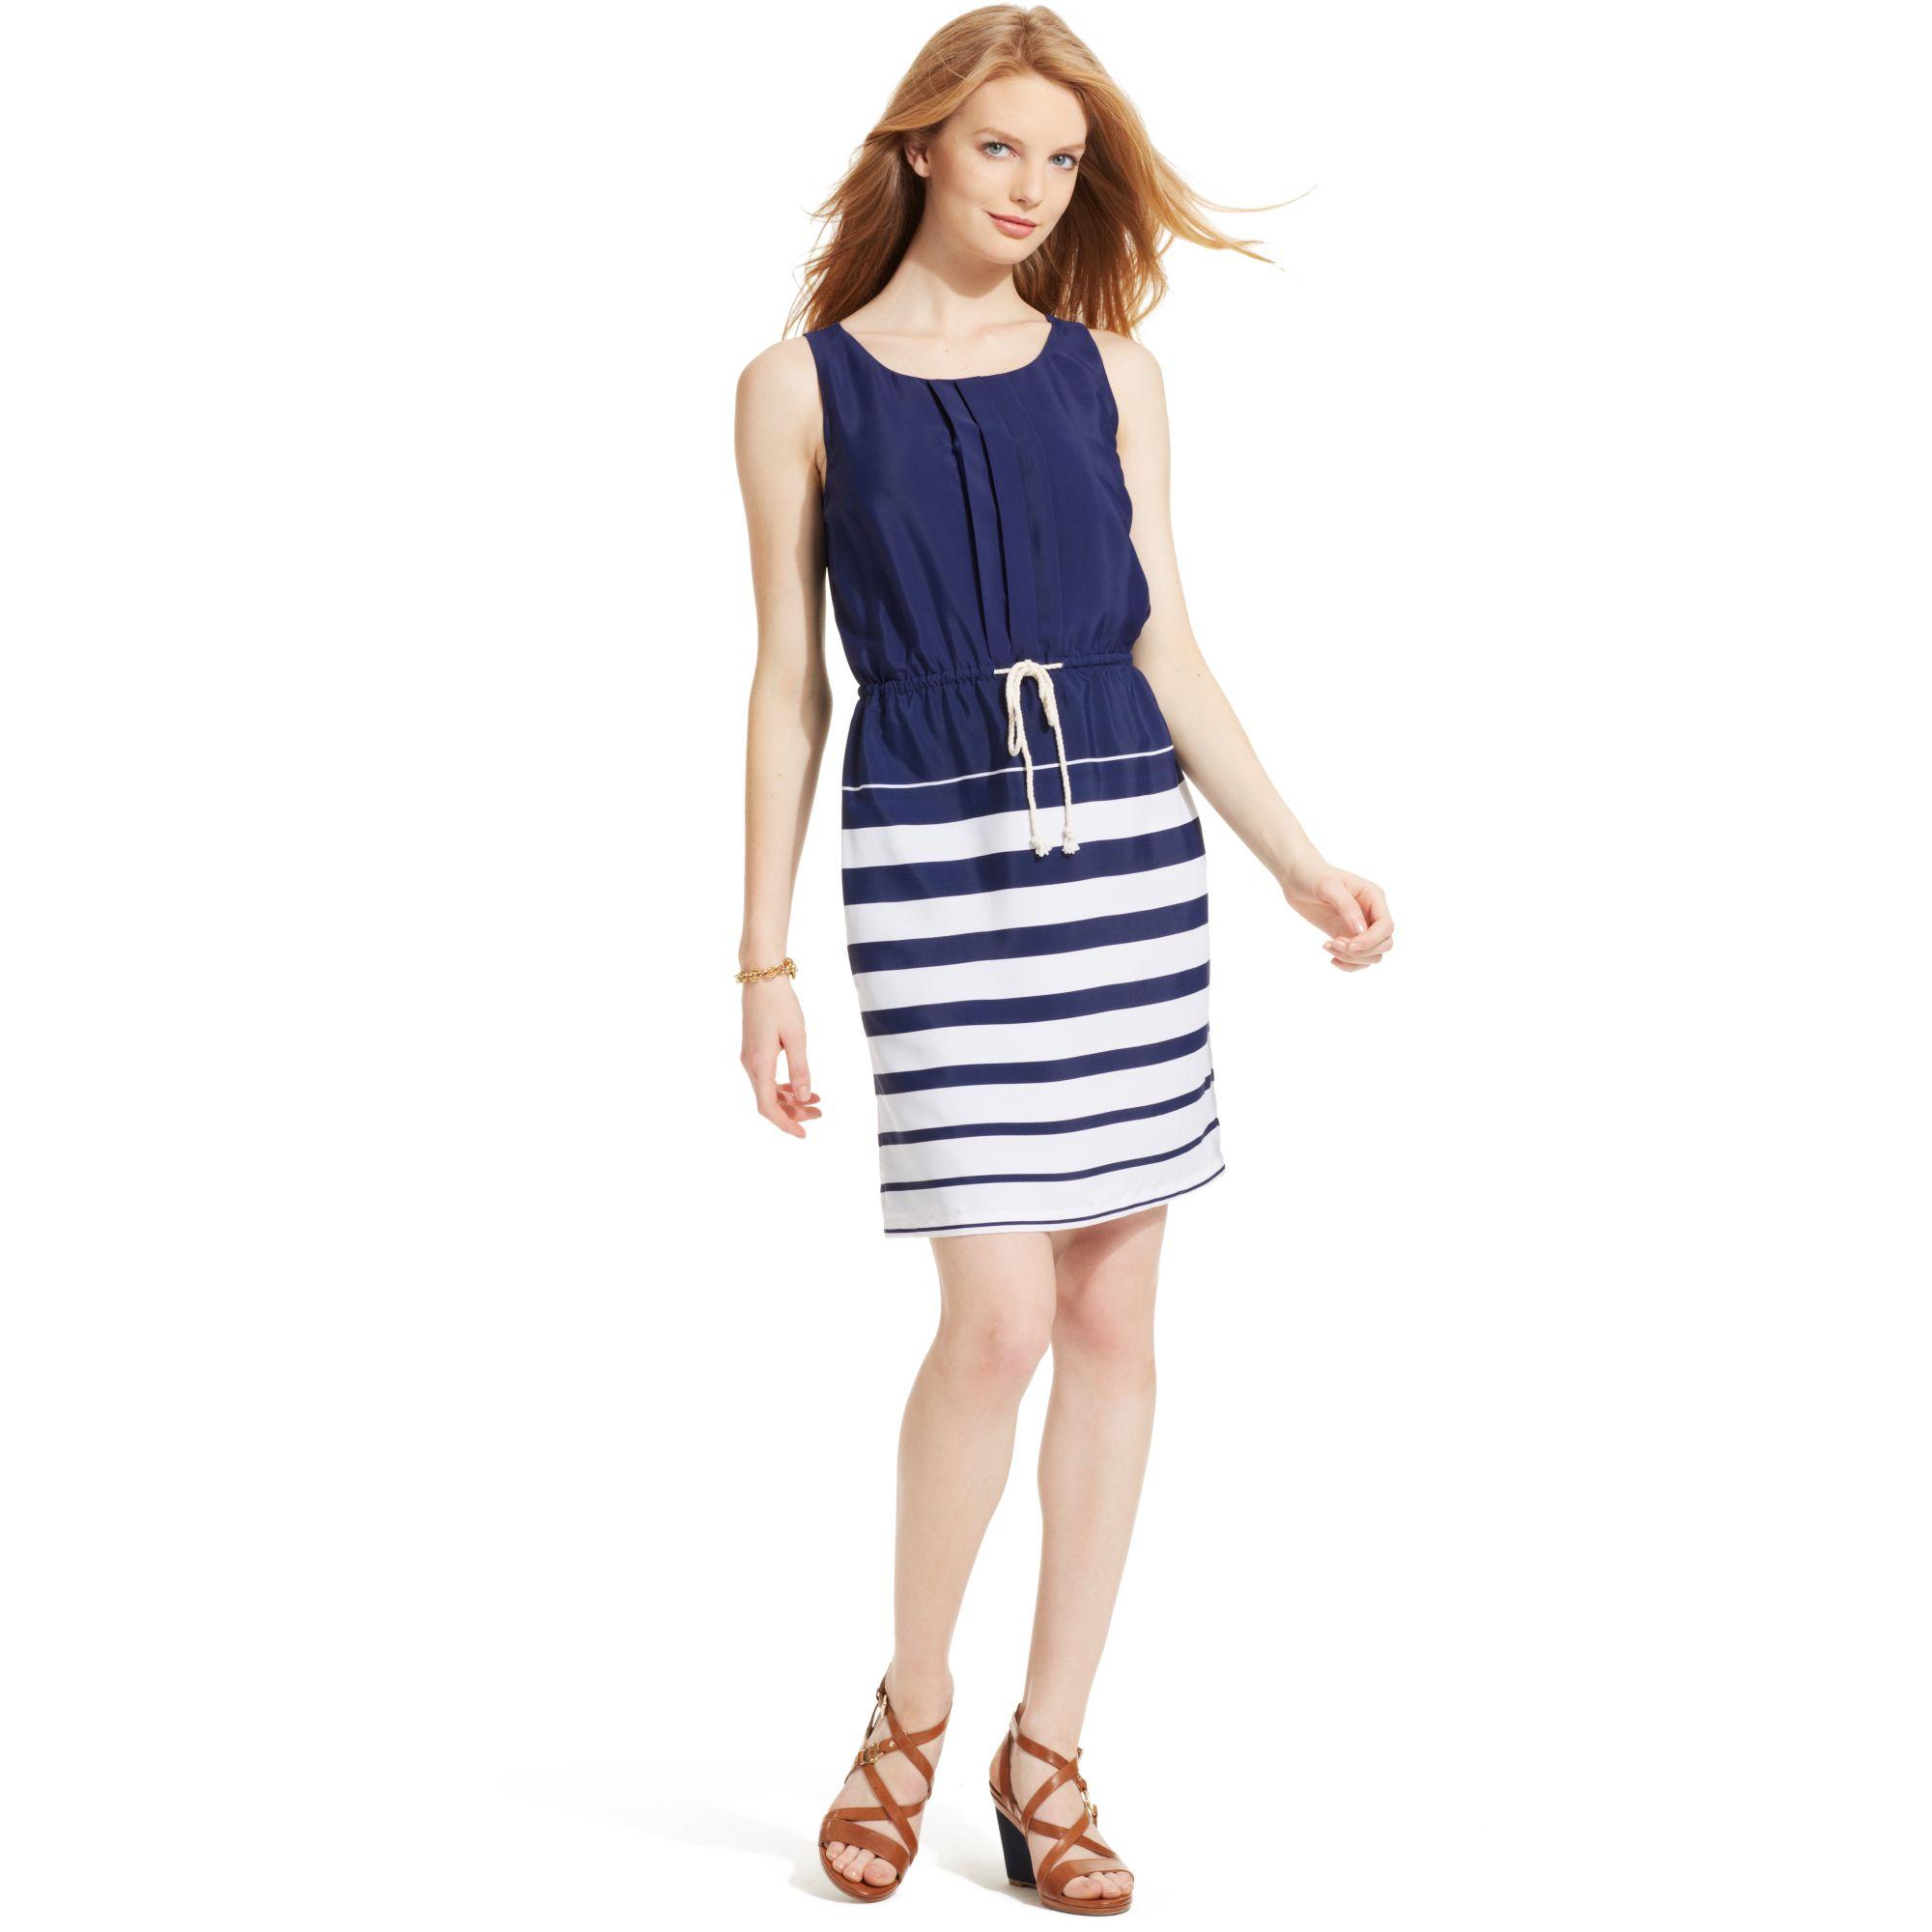 8c7b30928b541 Lyst - Tommy Hilfiger Sleeveless Striped Dress in Blue